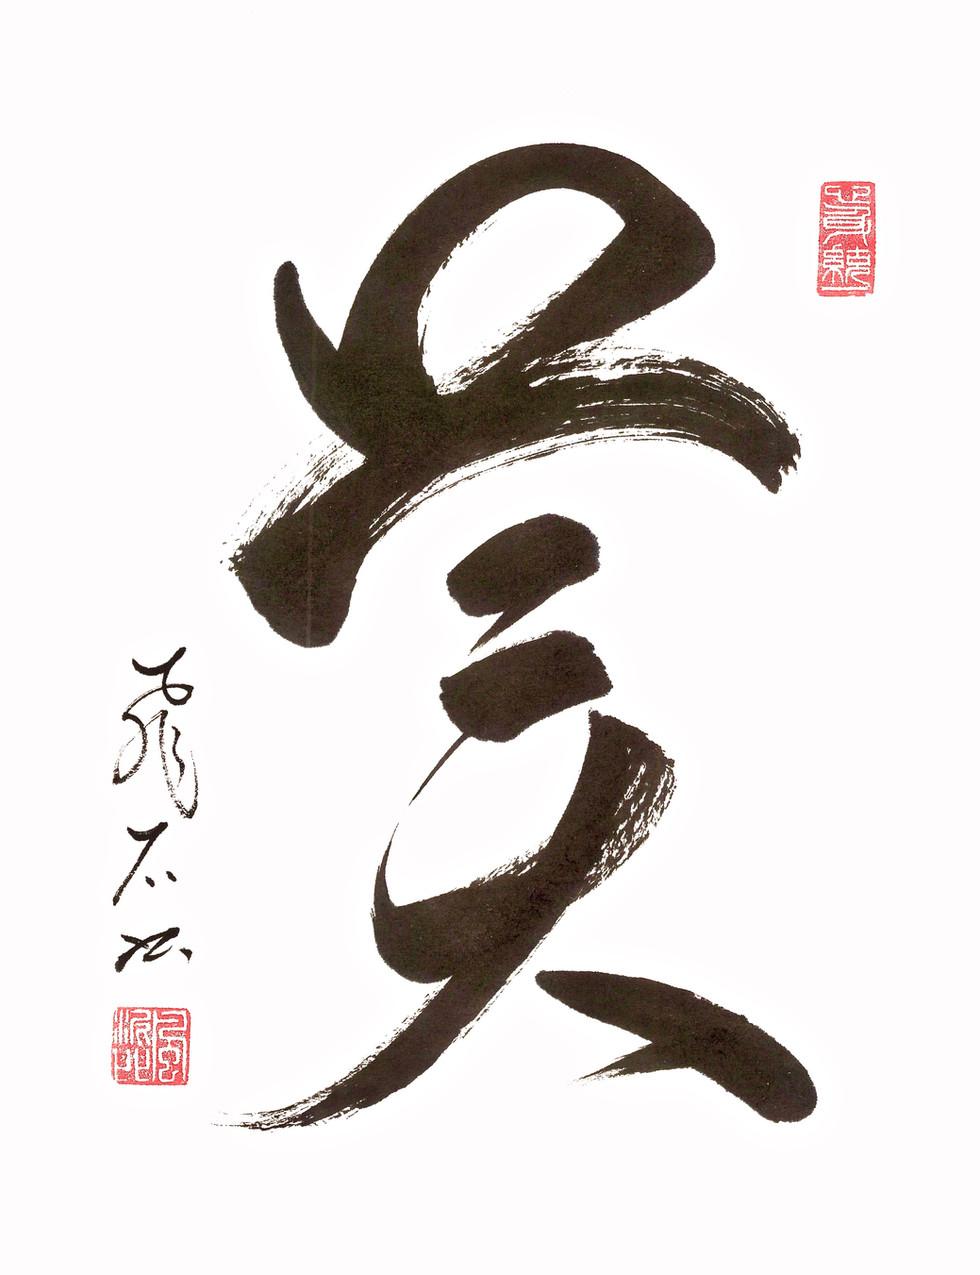 Utsukushii